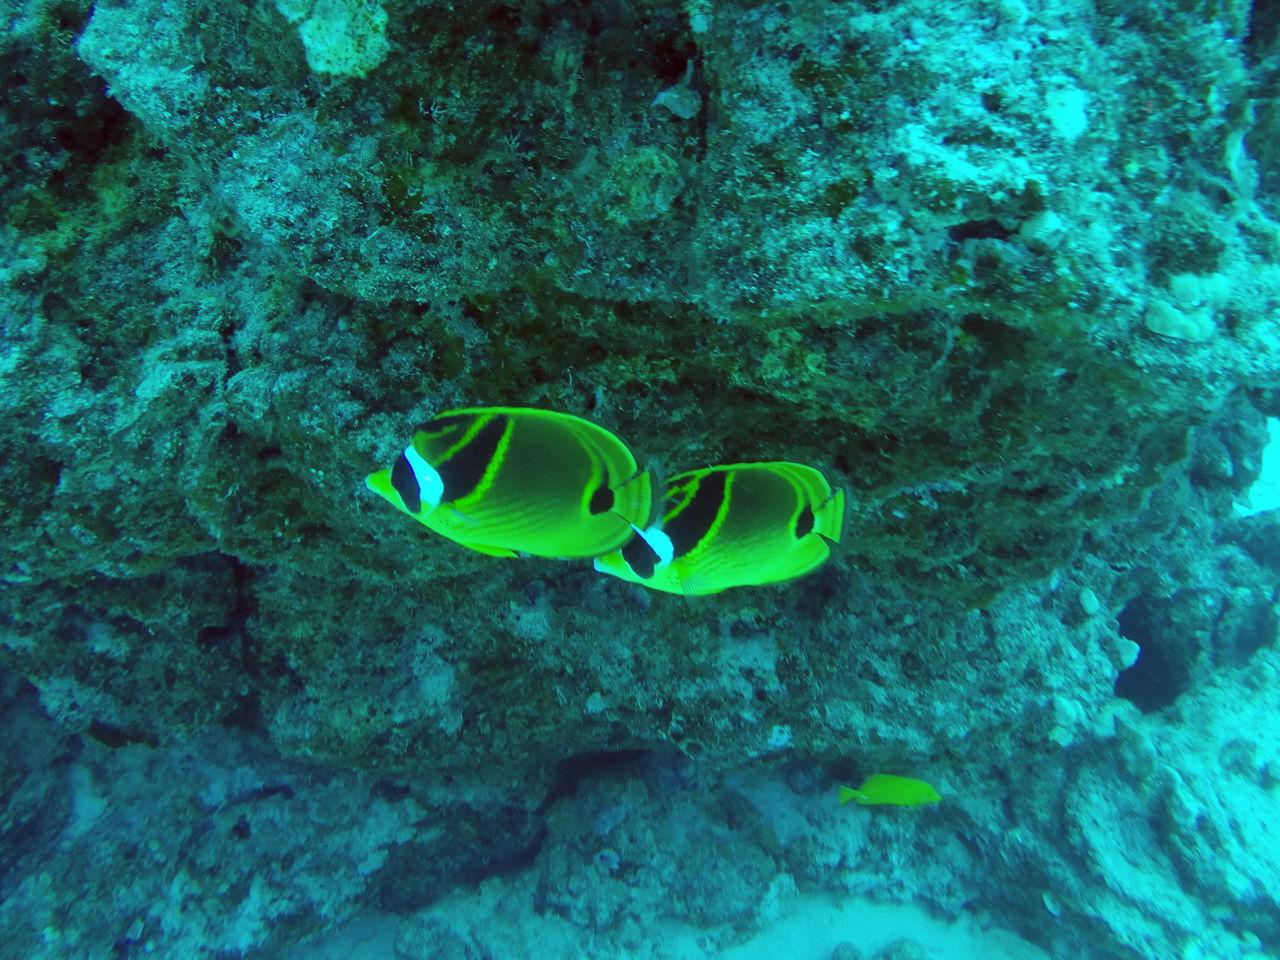 Bandits Fish Hawaii Kona SCUBA Scuba Diving